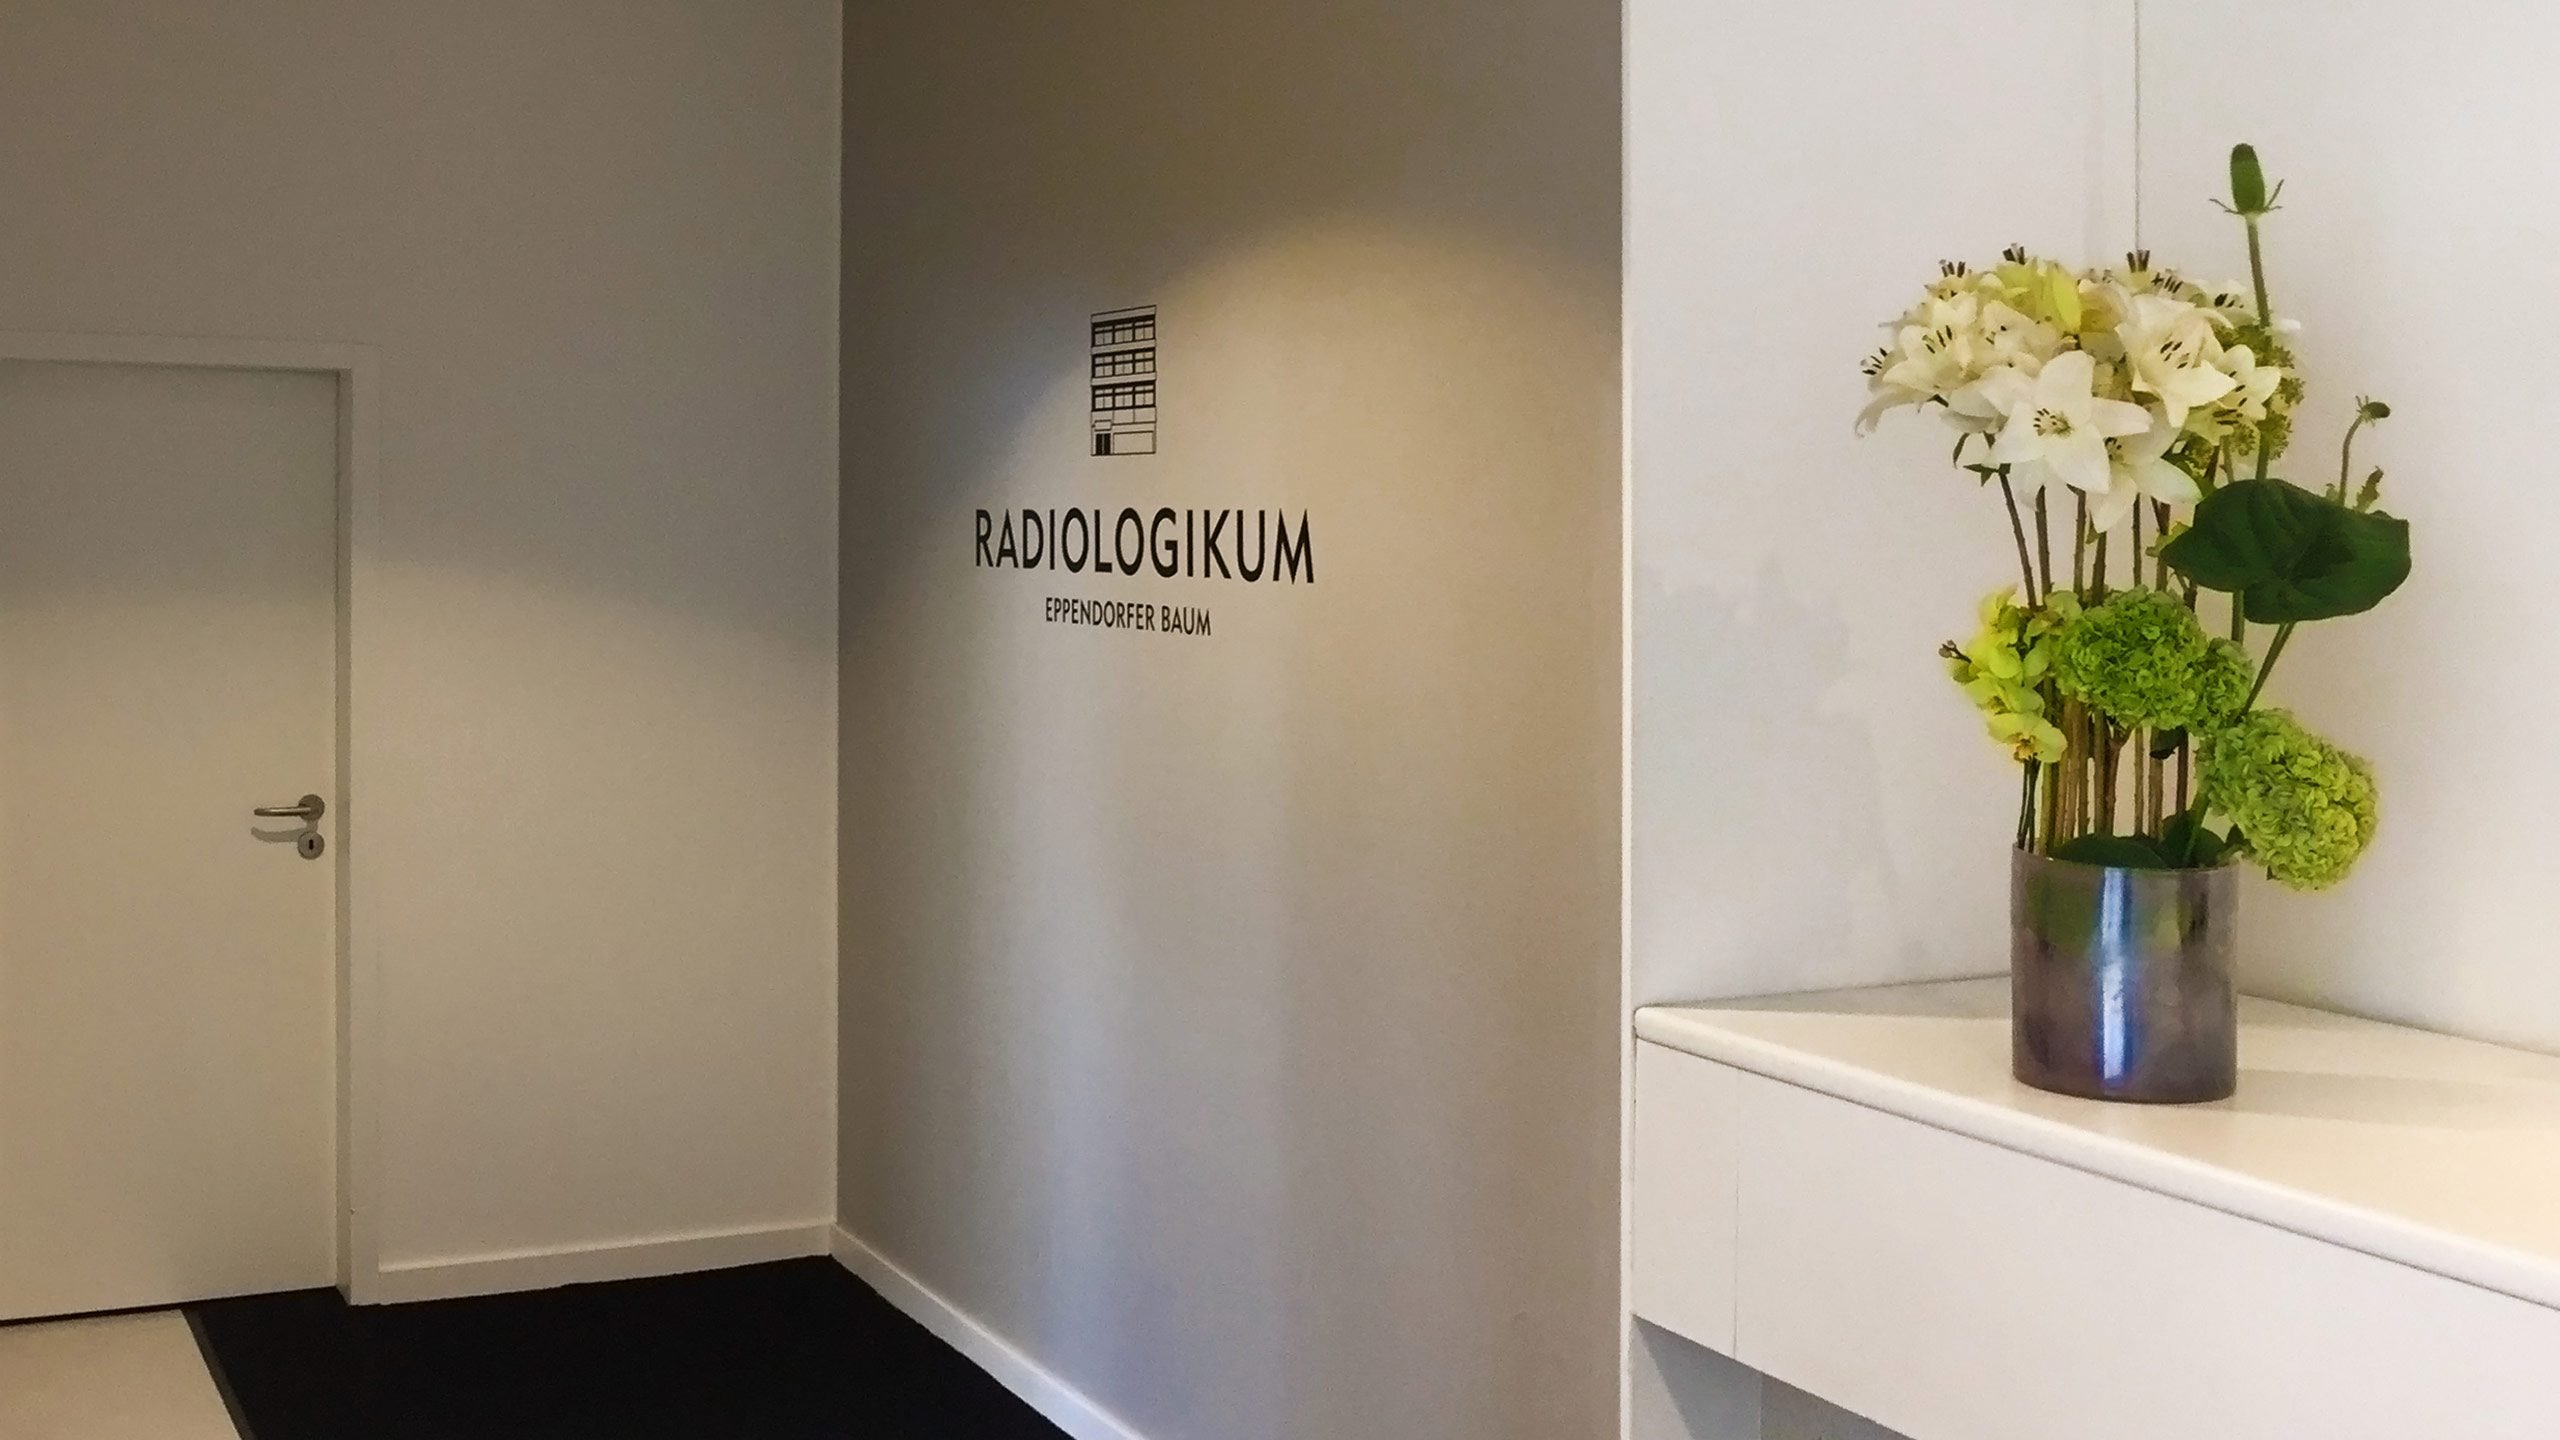 Radiologikum - Eppendorfer-Baum - Praxis-Empfang